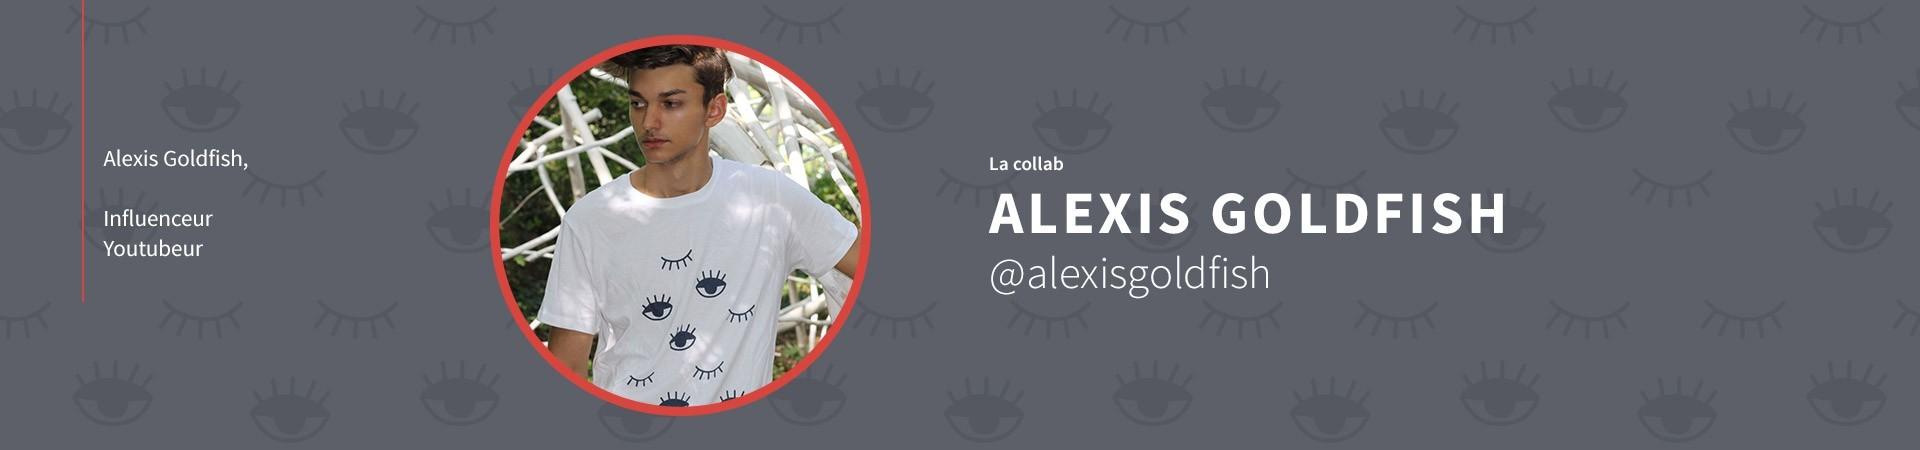 Alexis Goldfish